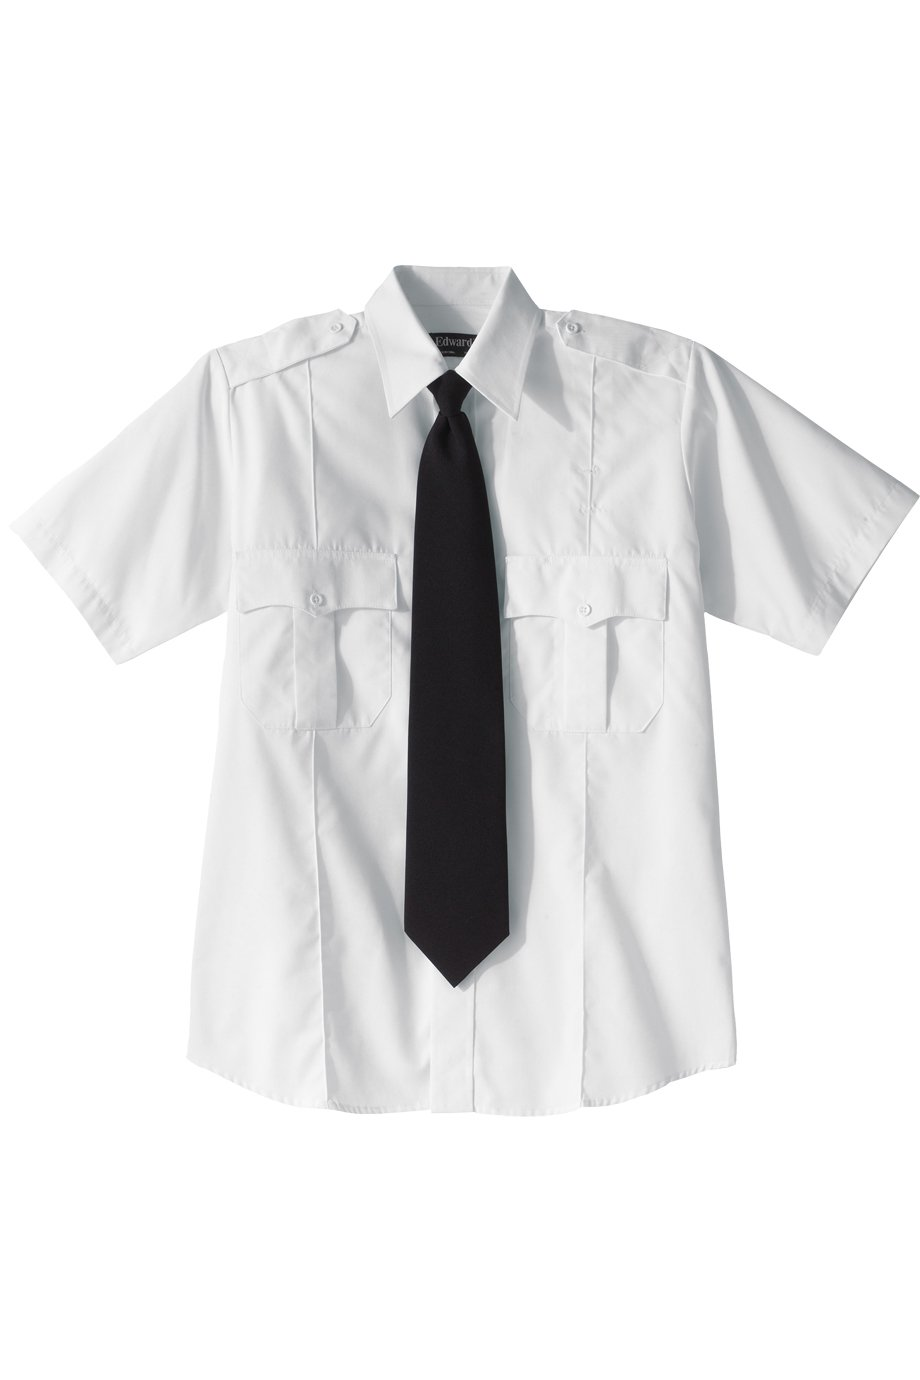 Ed Garments Men'S 1226 Durable Sleeve Civil Shirt (White 6X-L-T)